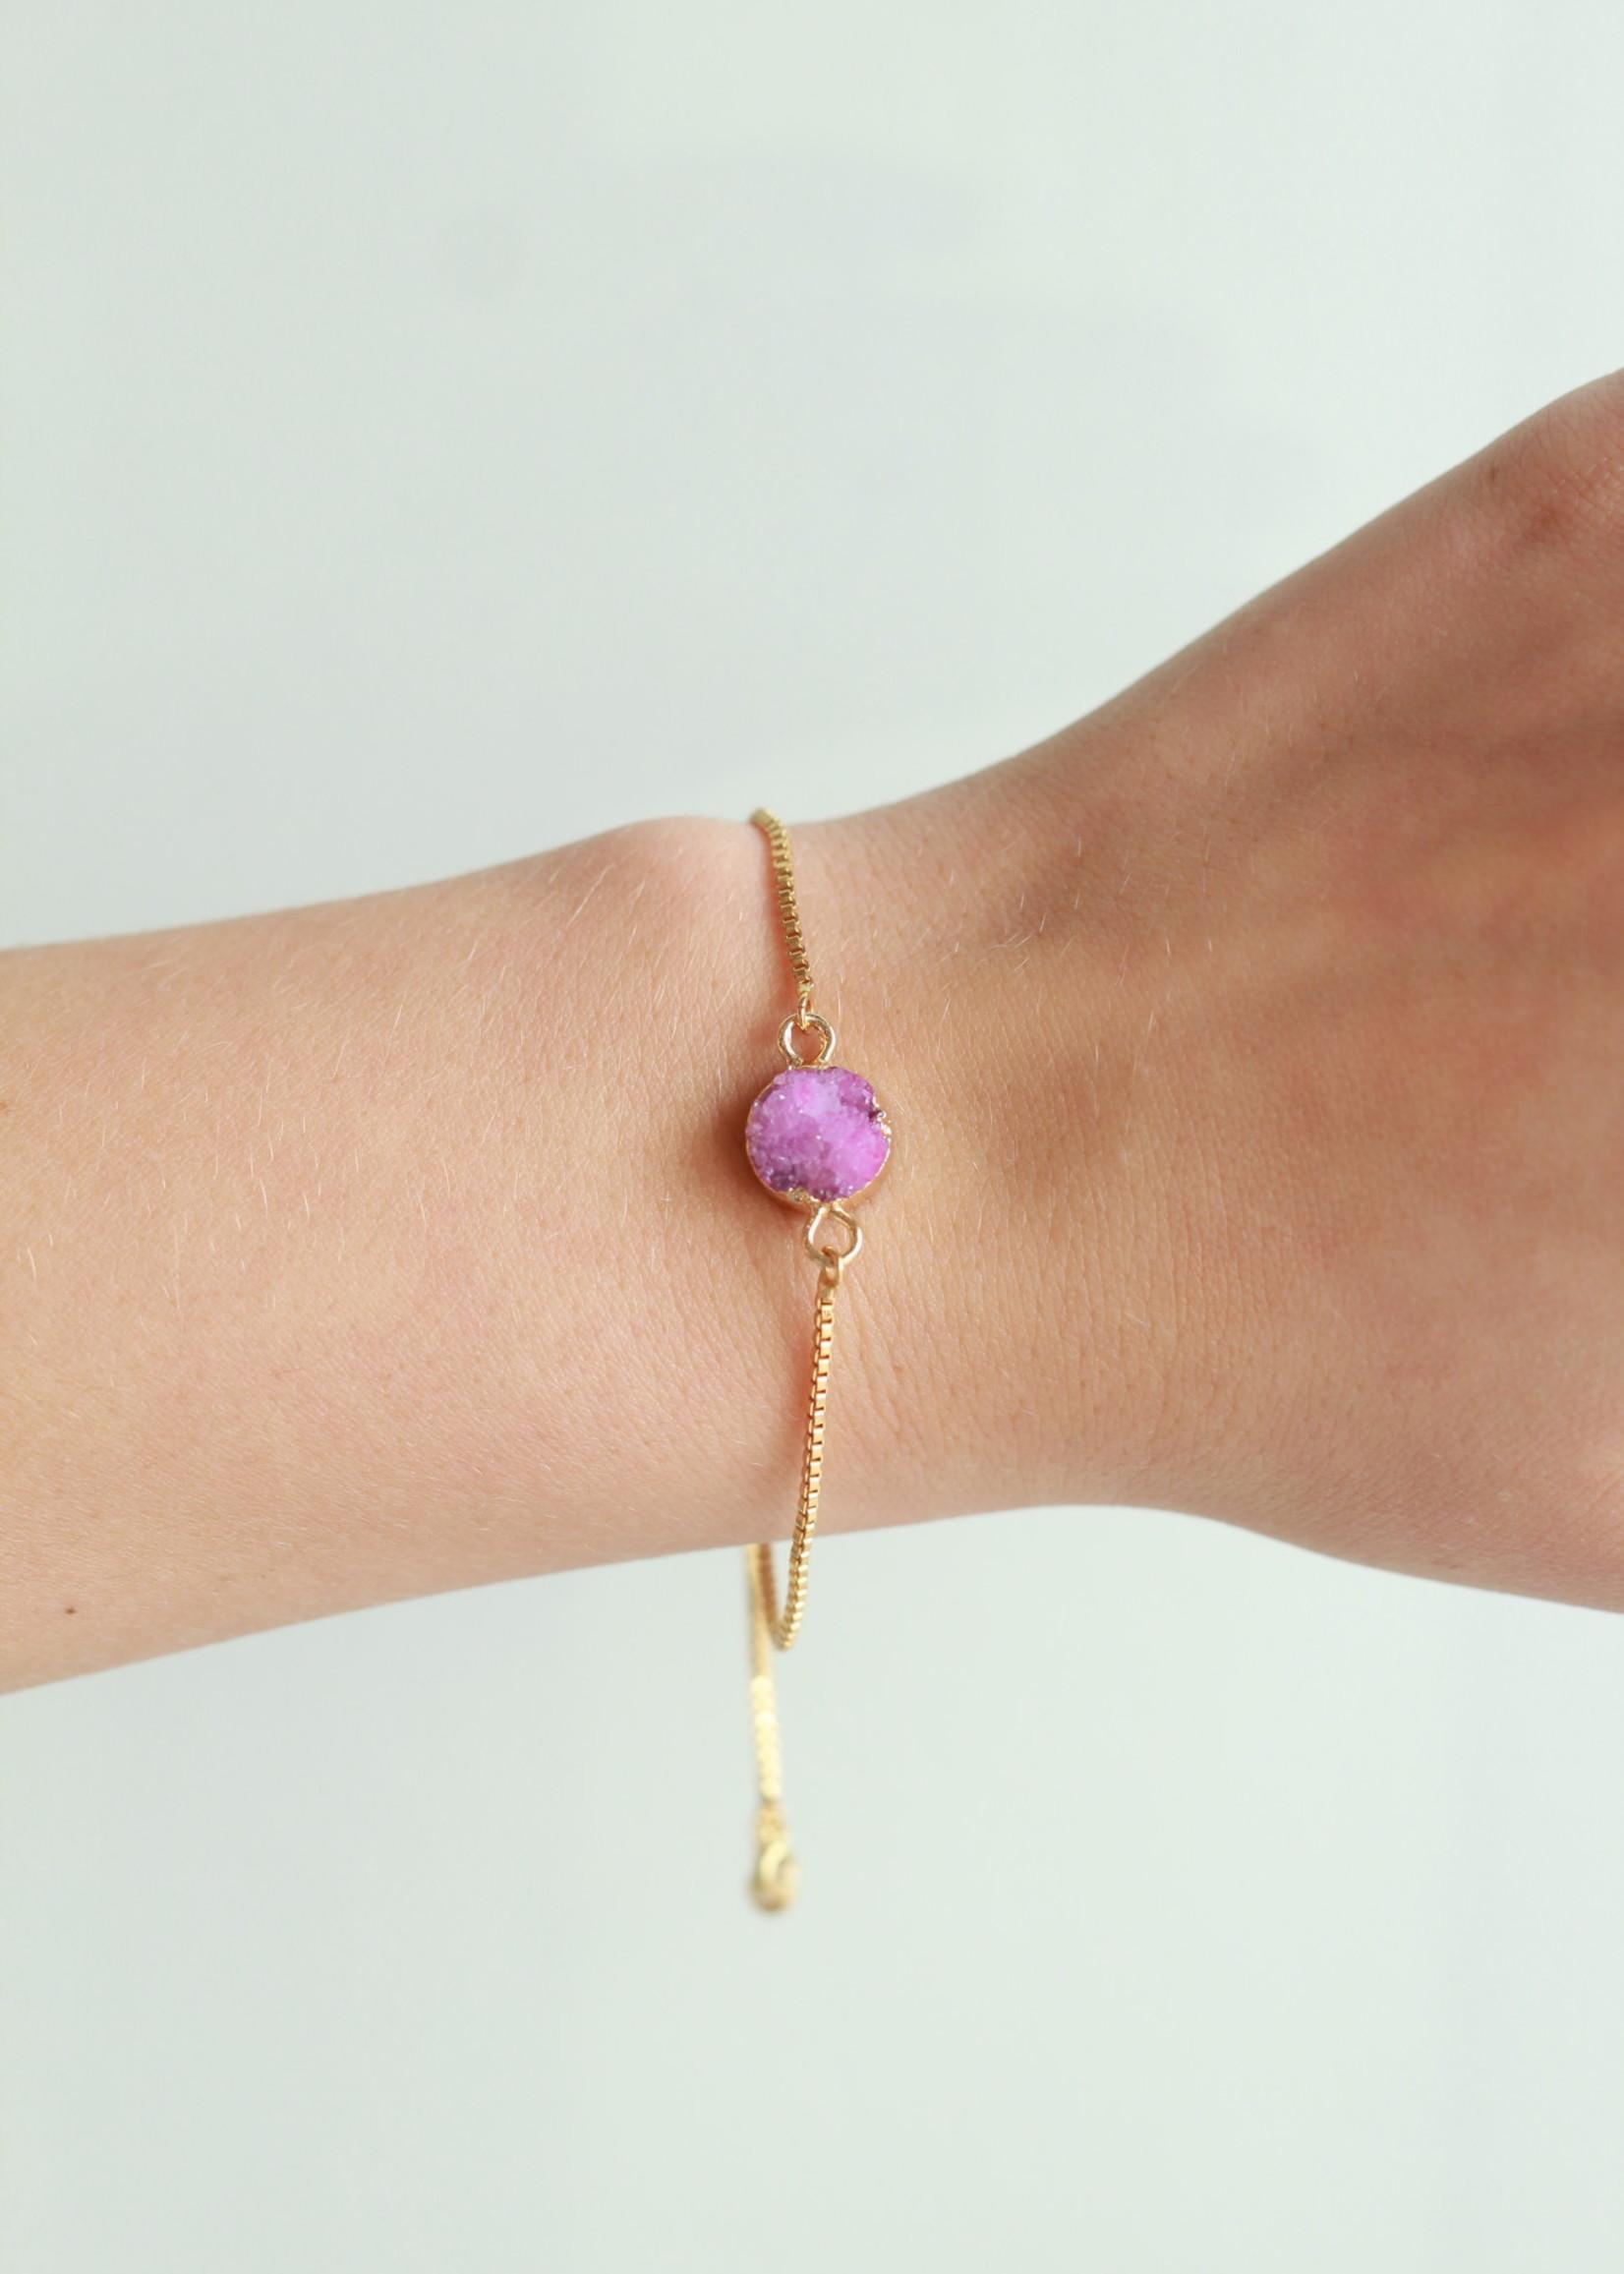 Allison Conway AC Bright Pink Druzy Bracelet